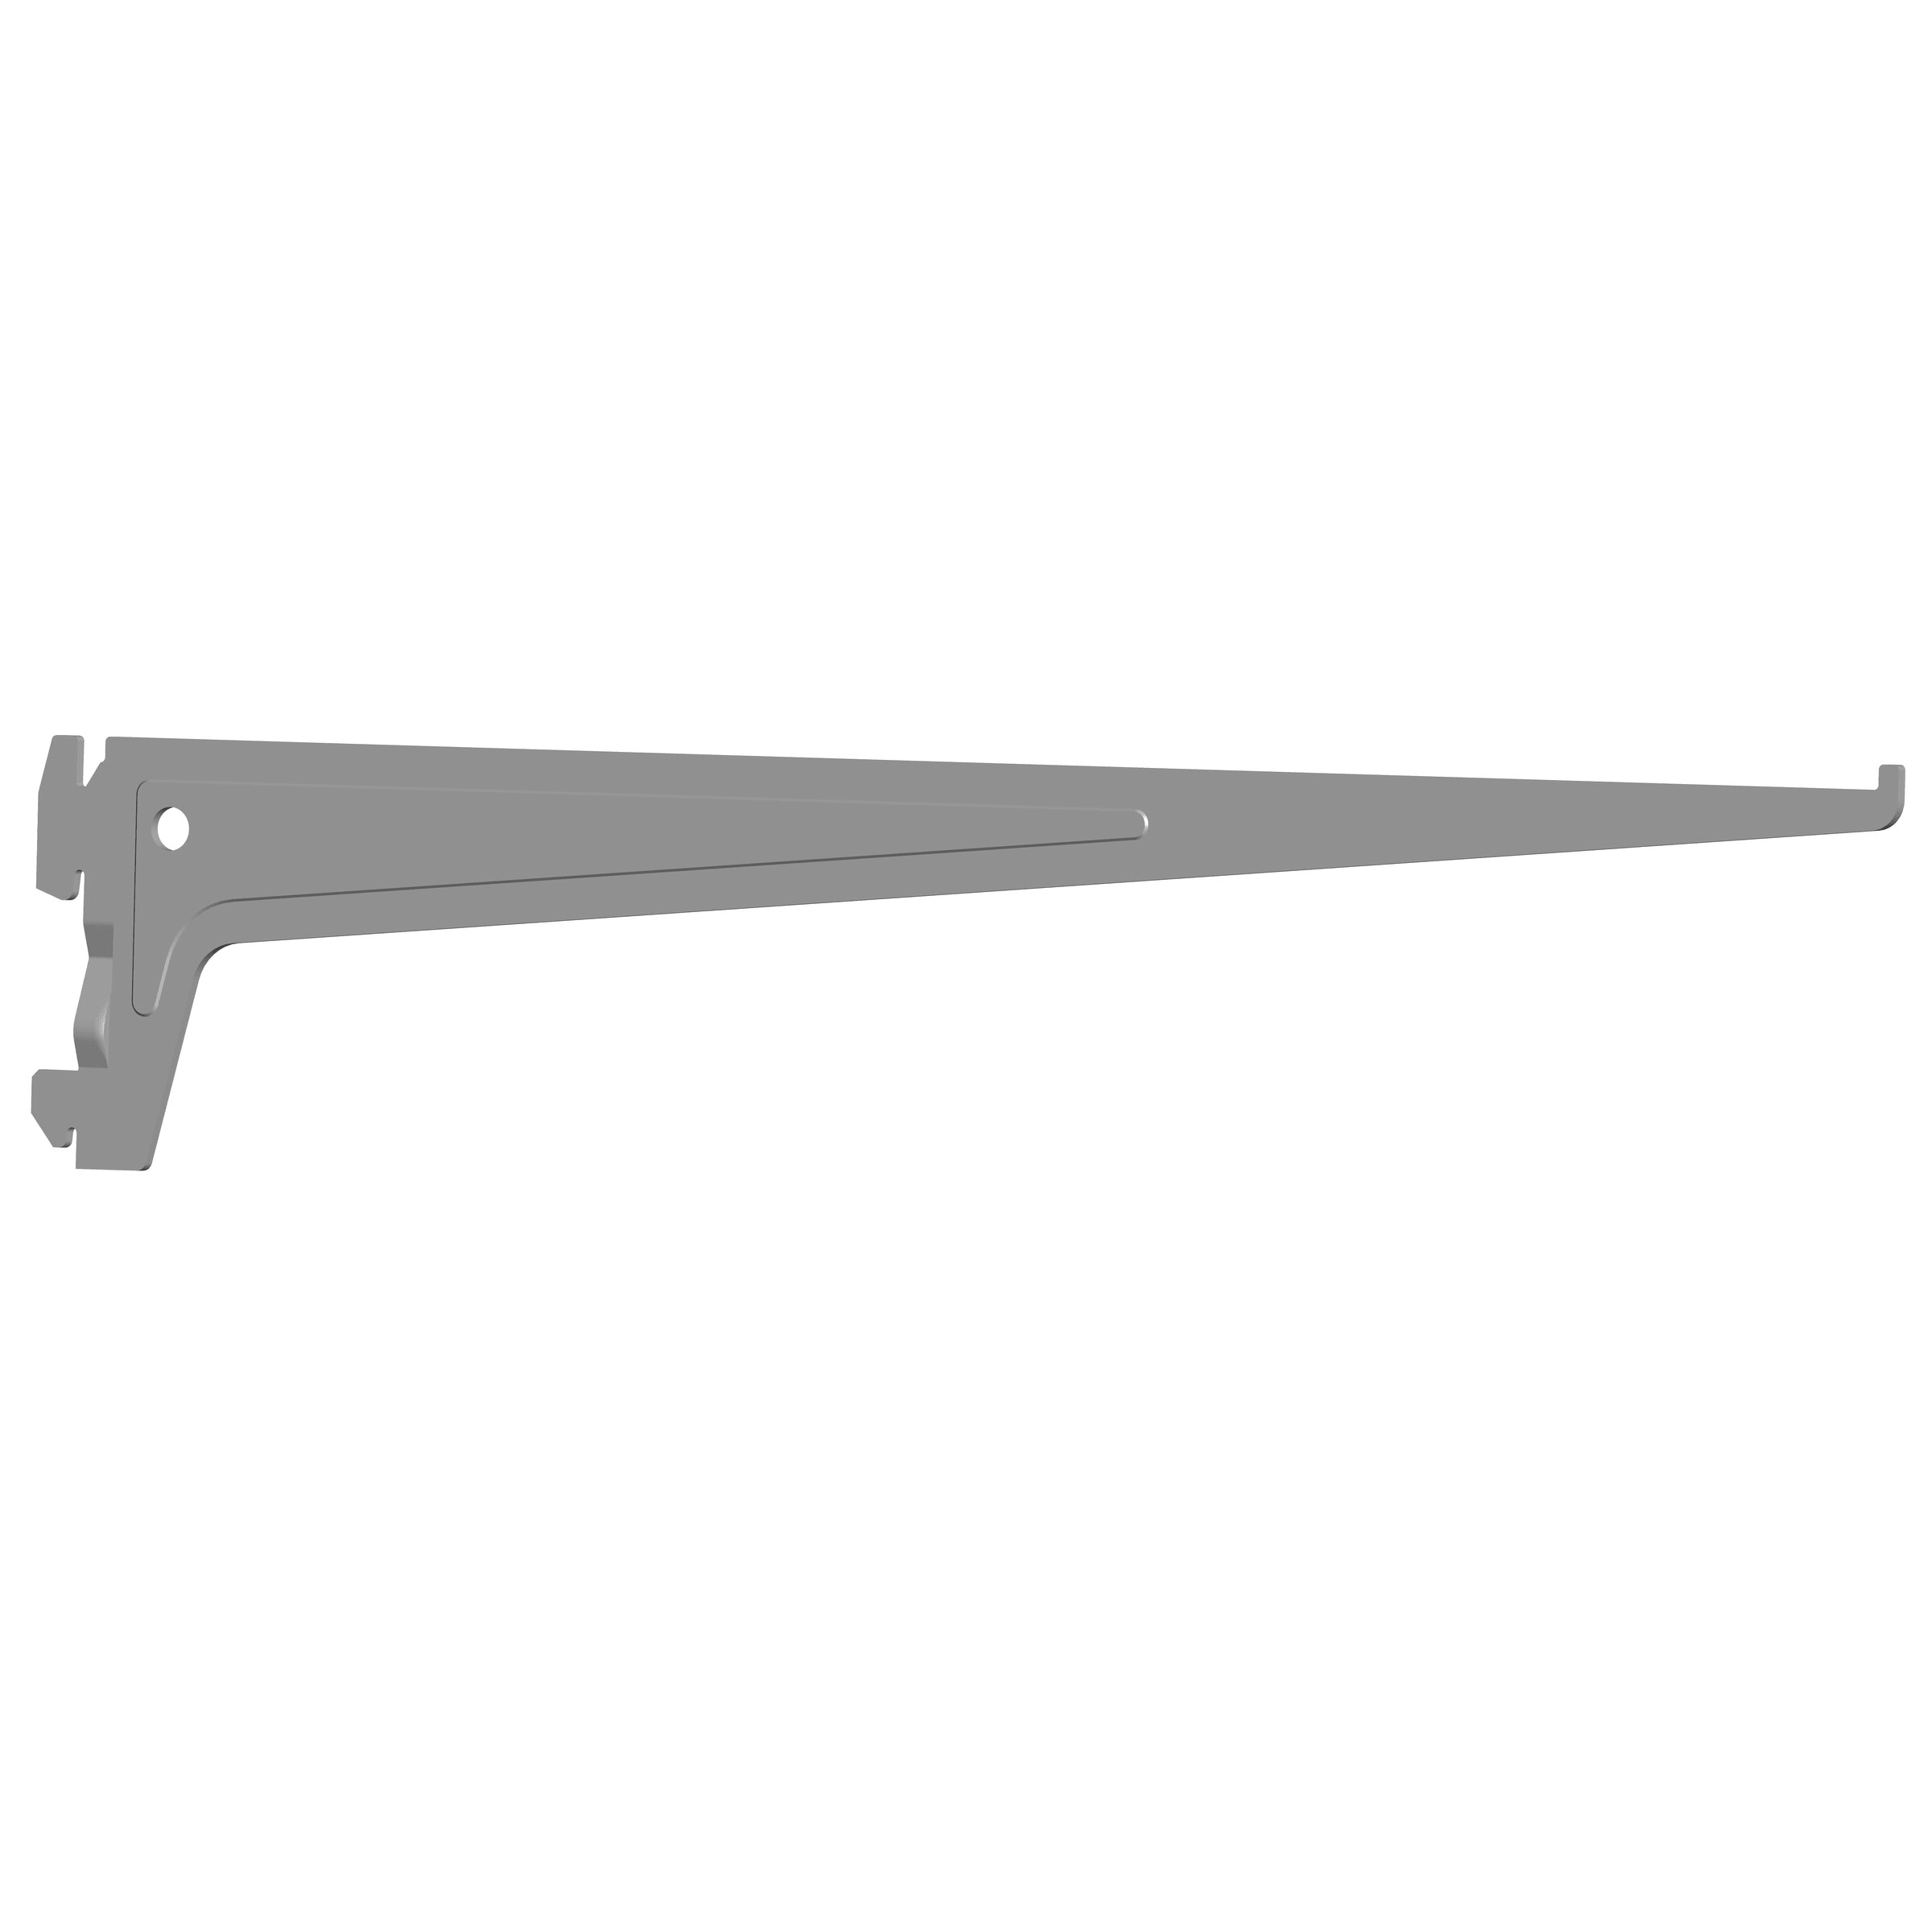 ELEMENTSYSTEM PRO-Träger CLASSIC weissalu 400 mm